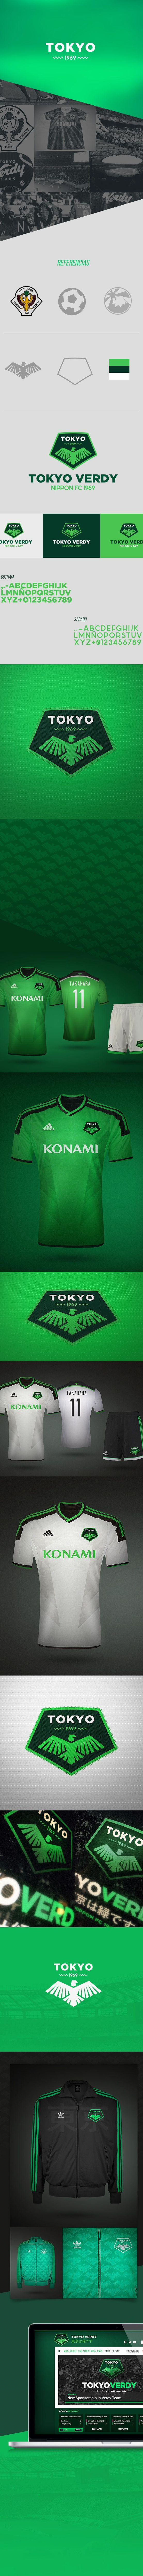 J-League · Tokyo Verdy on Behance